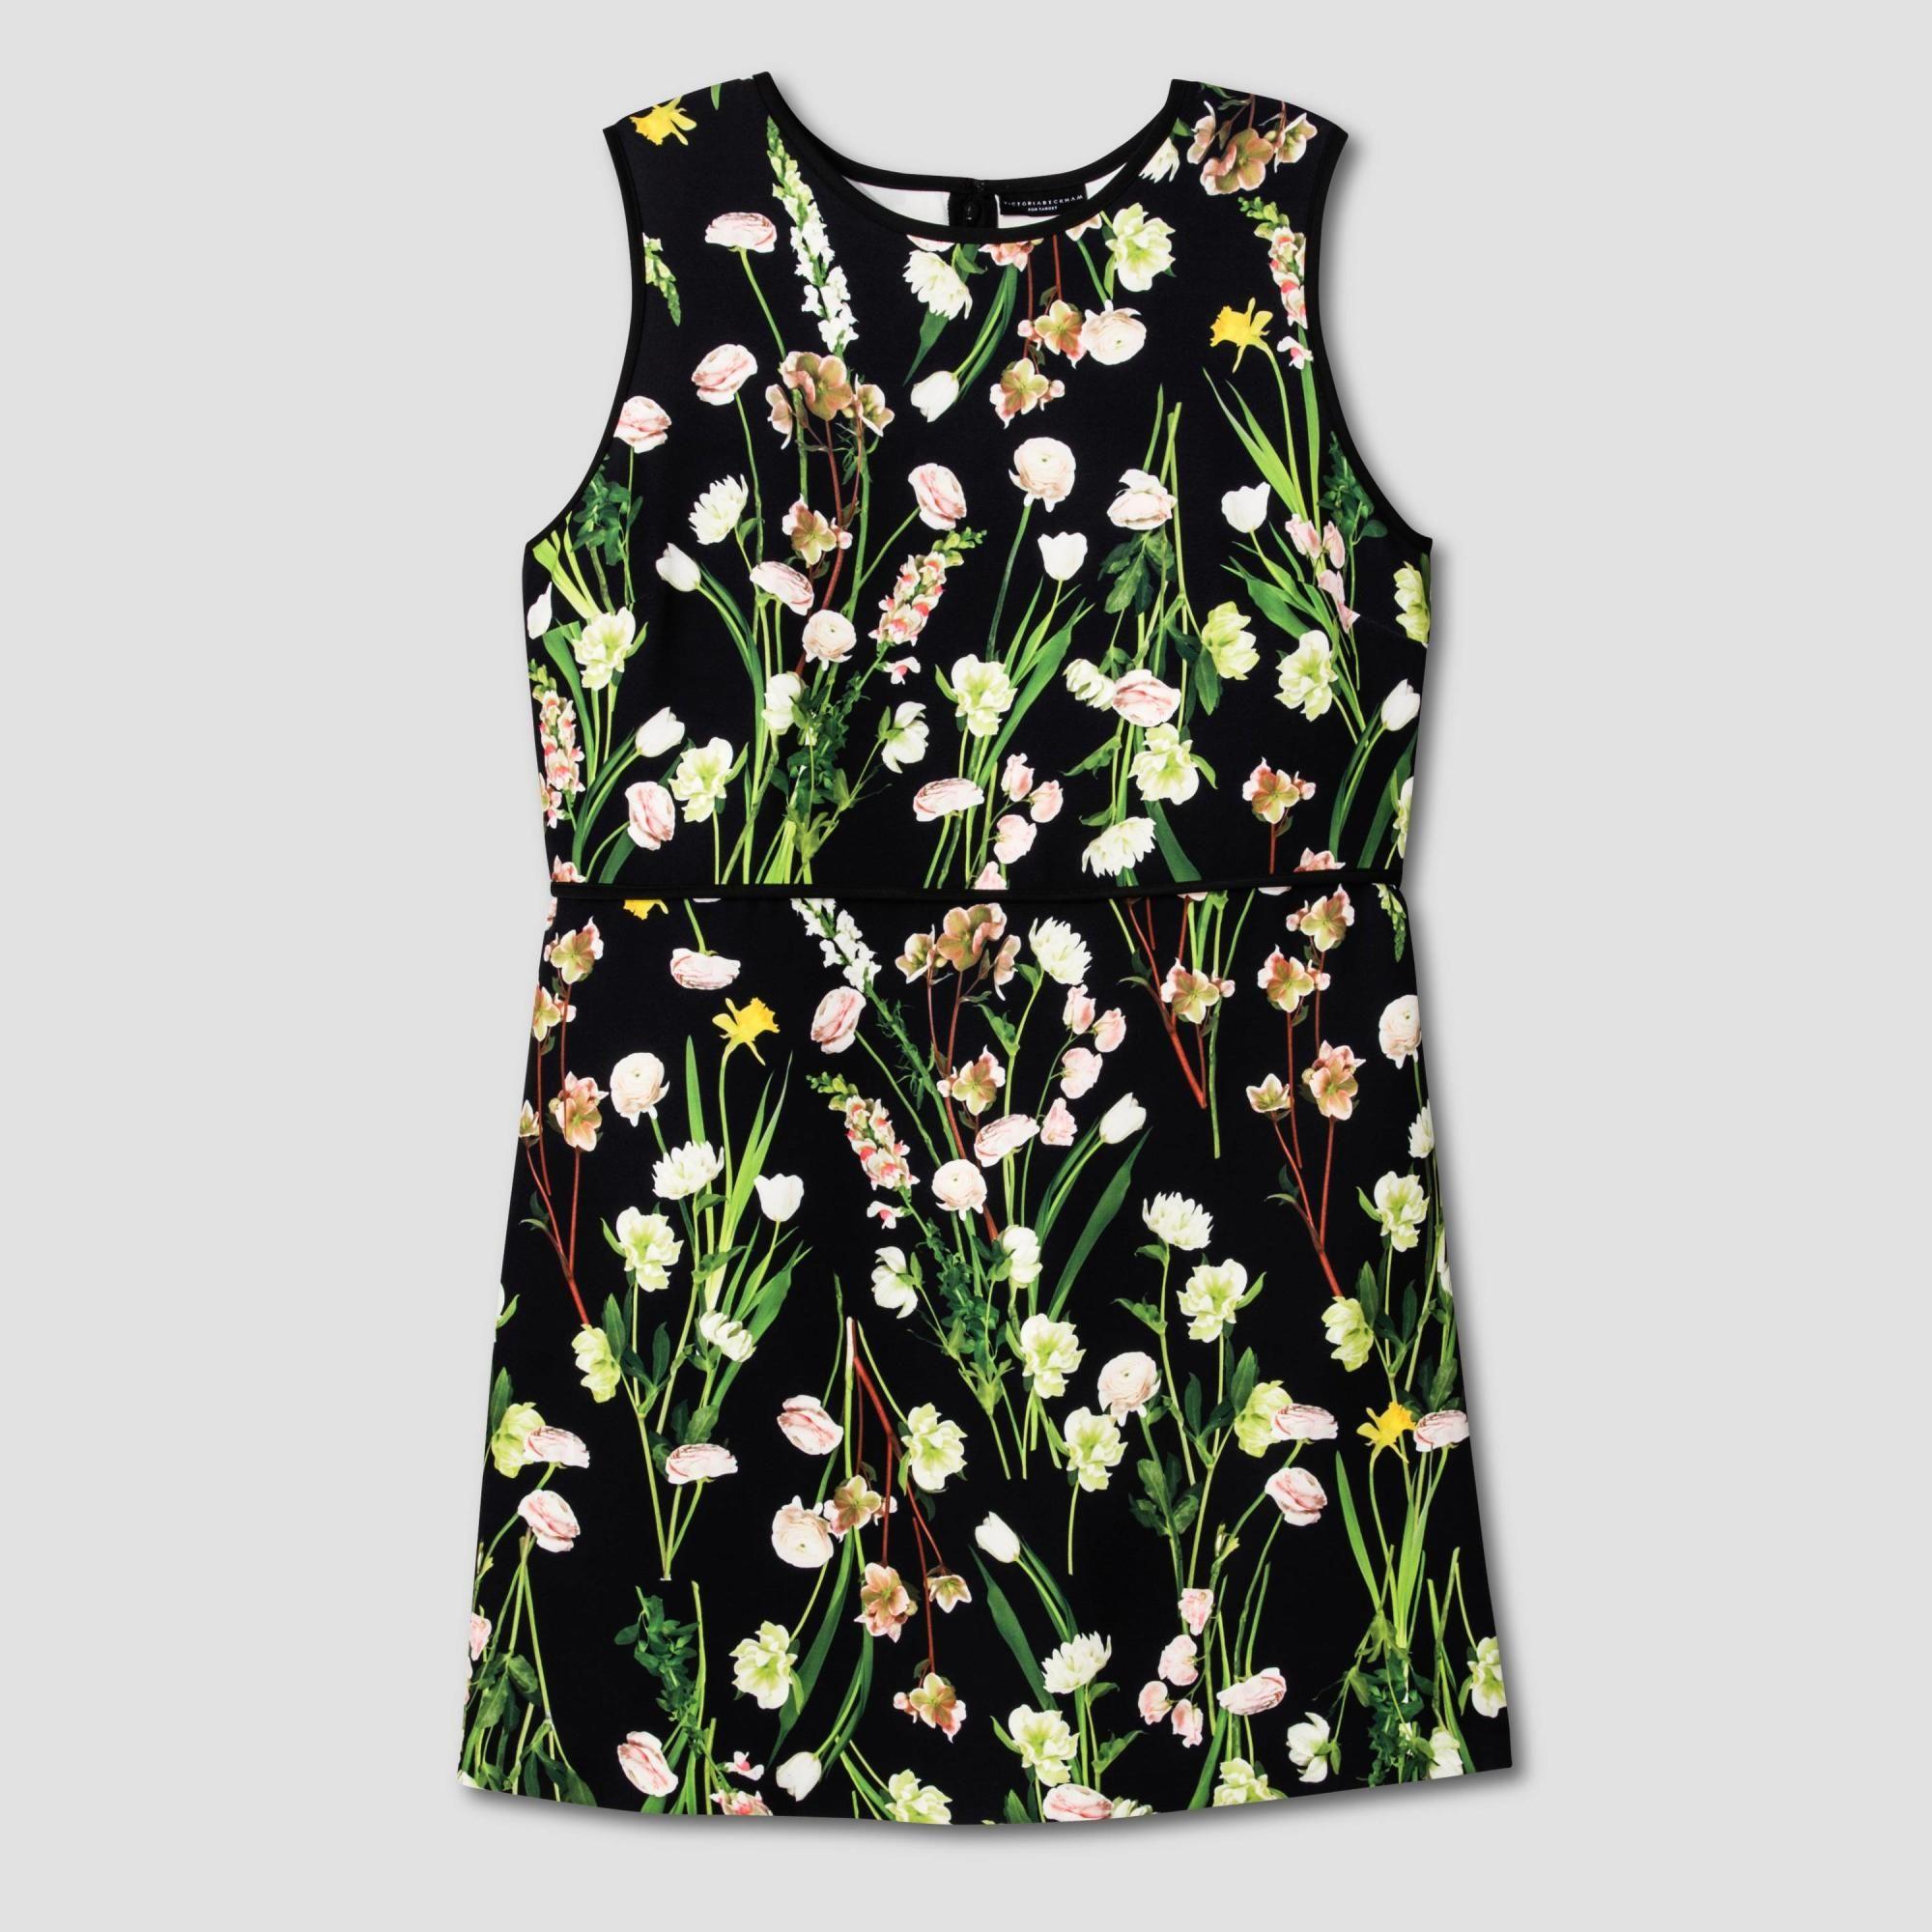 cb059e747ce Victoria Beckham for Target Womens  Plus Black English Floral Satin Dress